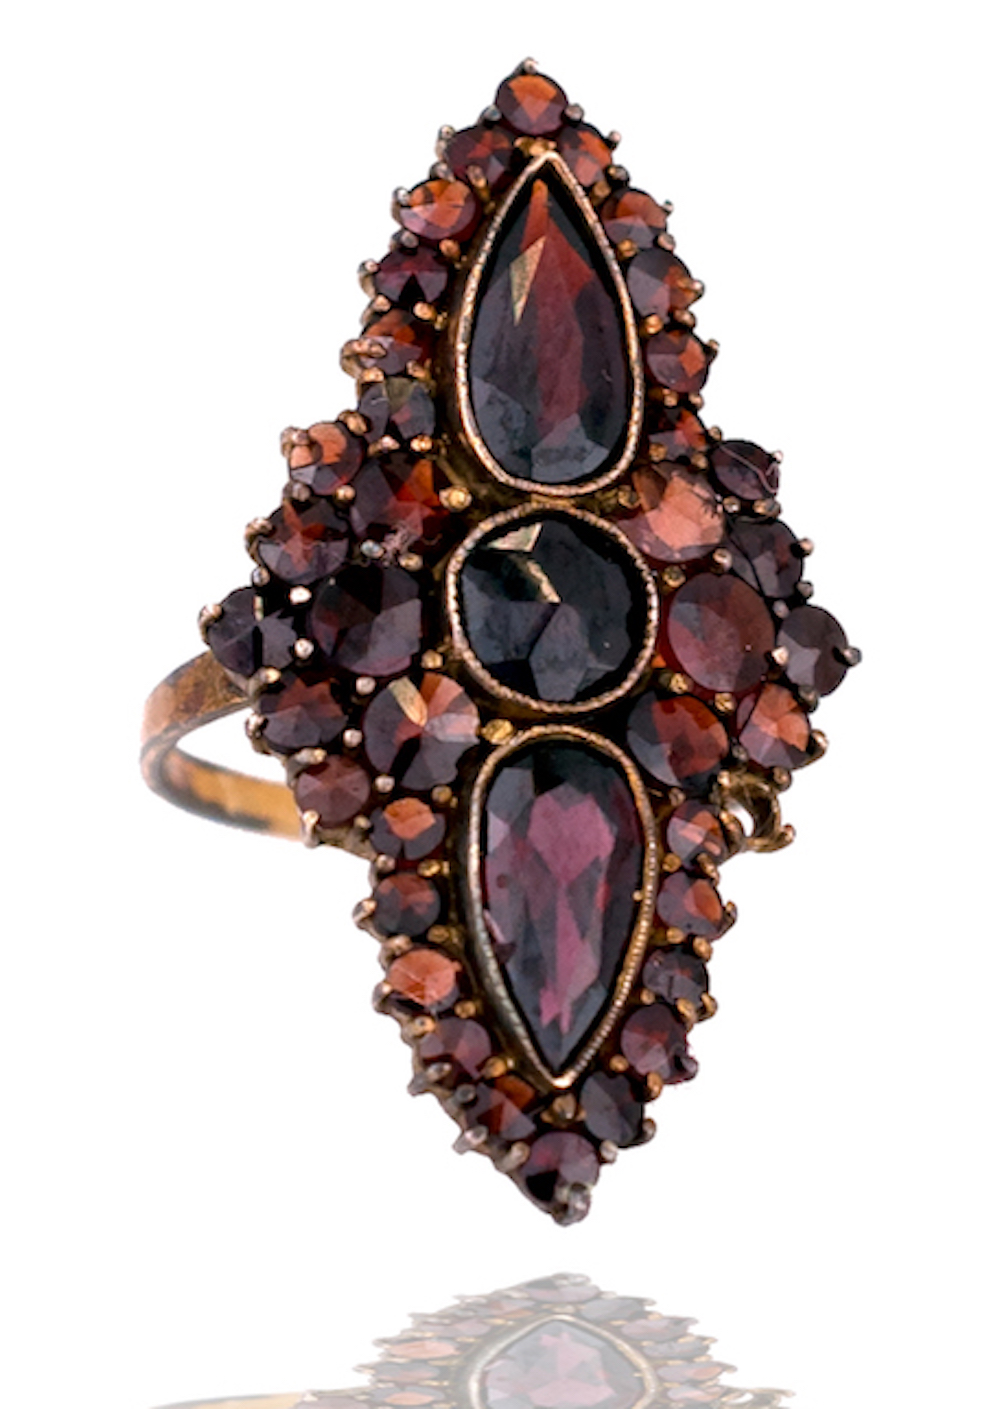 Lot 8678: Antique, Saks Garnet 4.25 CT.Marquise Shaped Ring, 14kt.